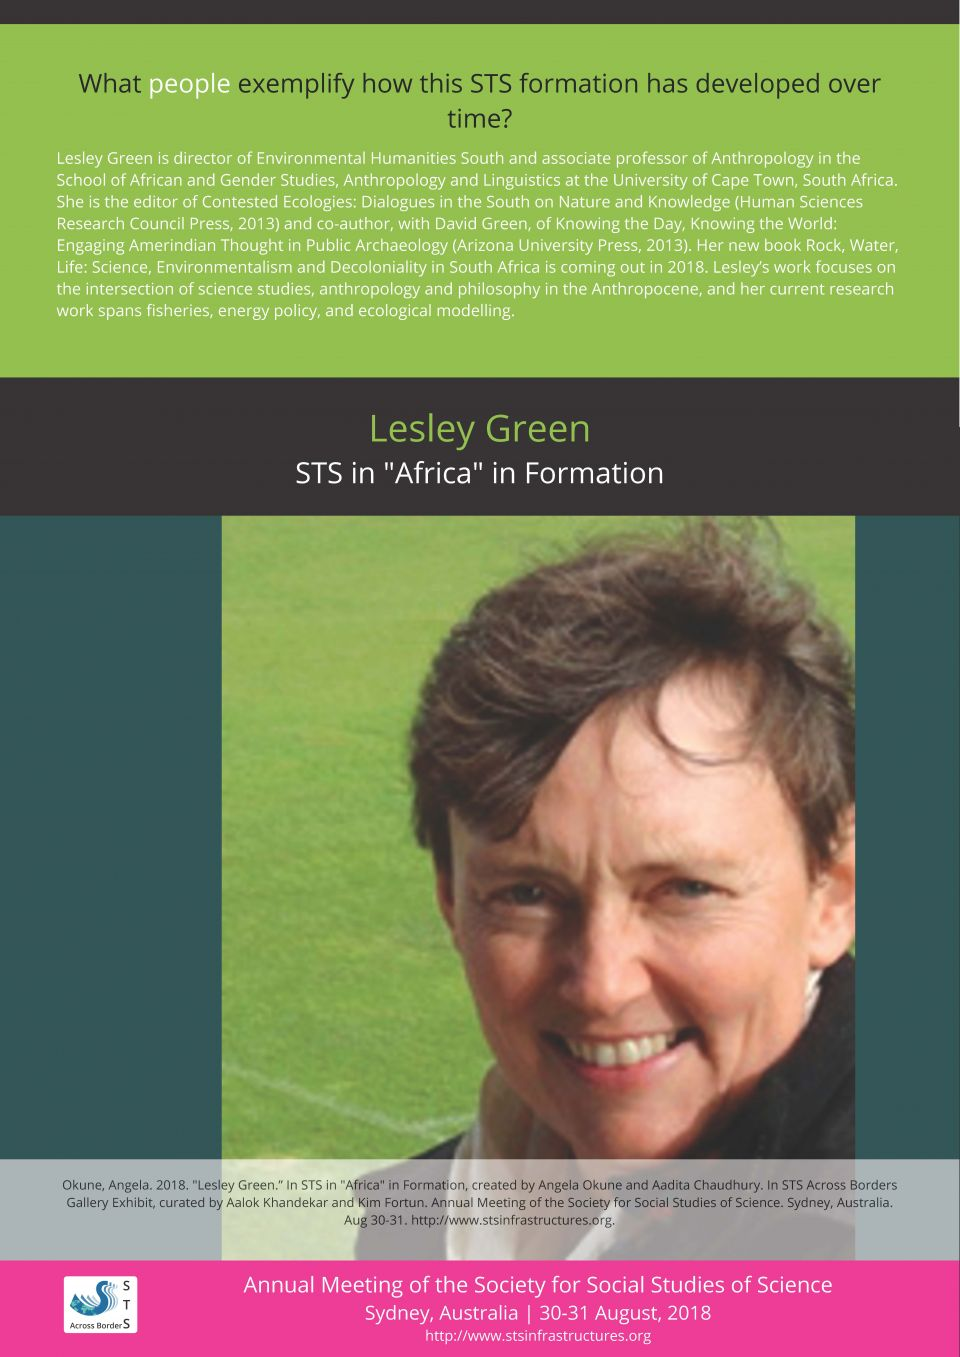 Lesley Green